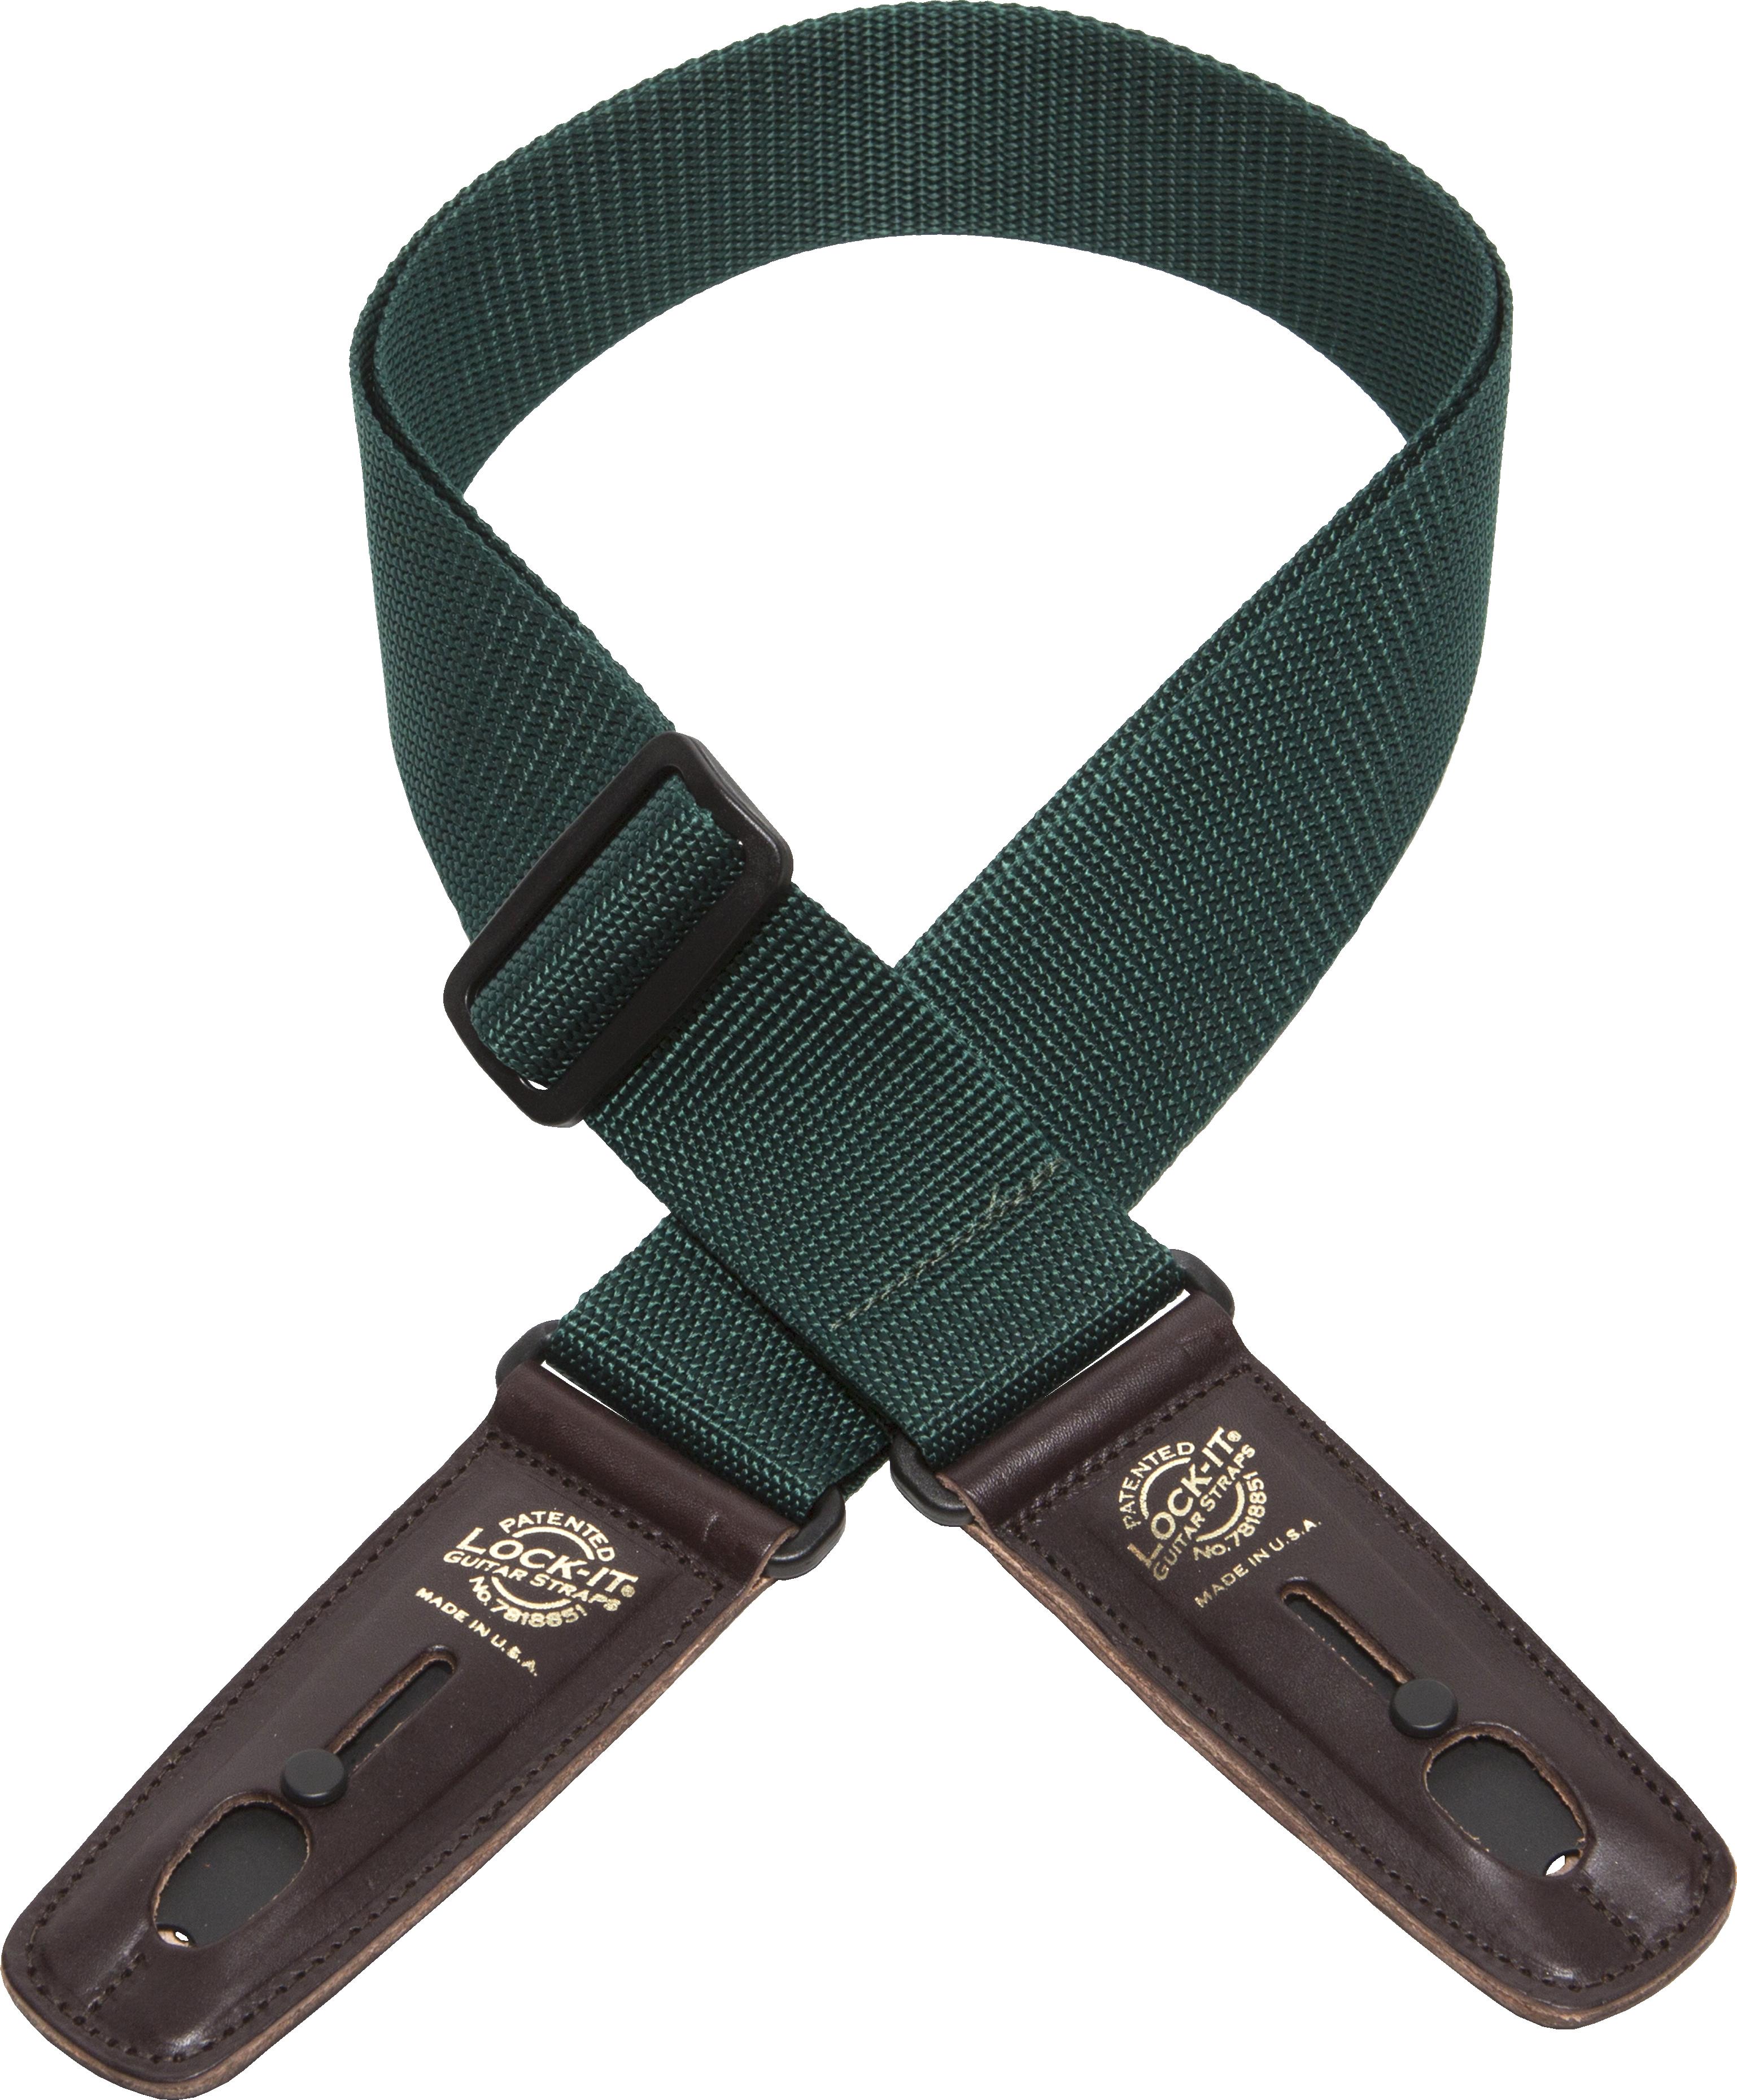 Lock-It 2 Inch PolyPro Strap - Dark Green